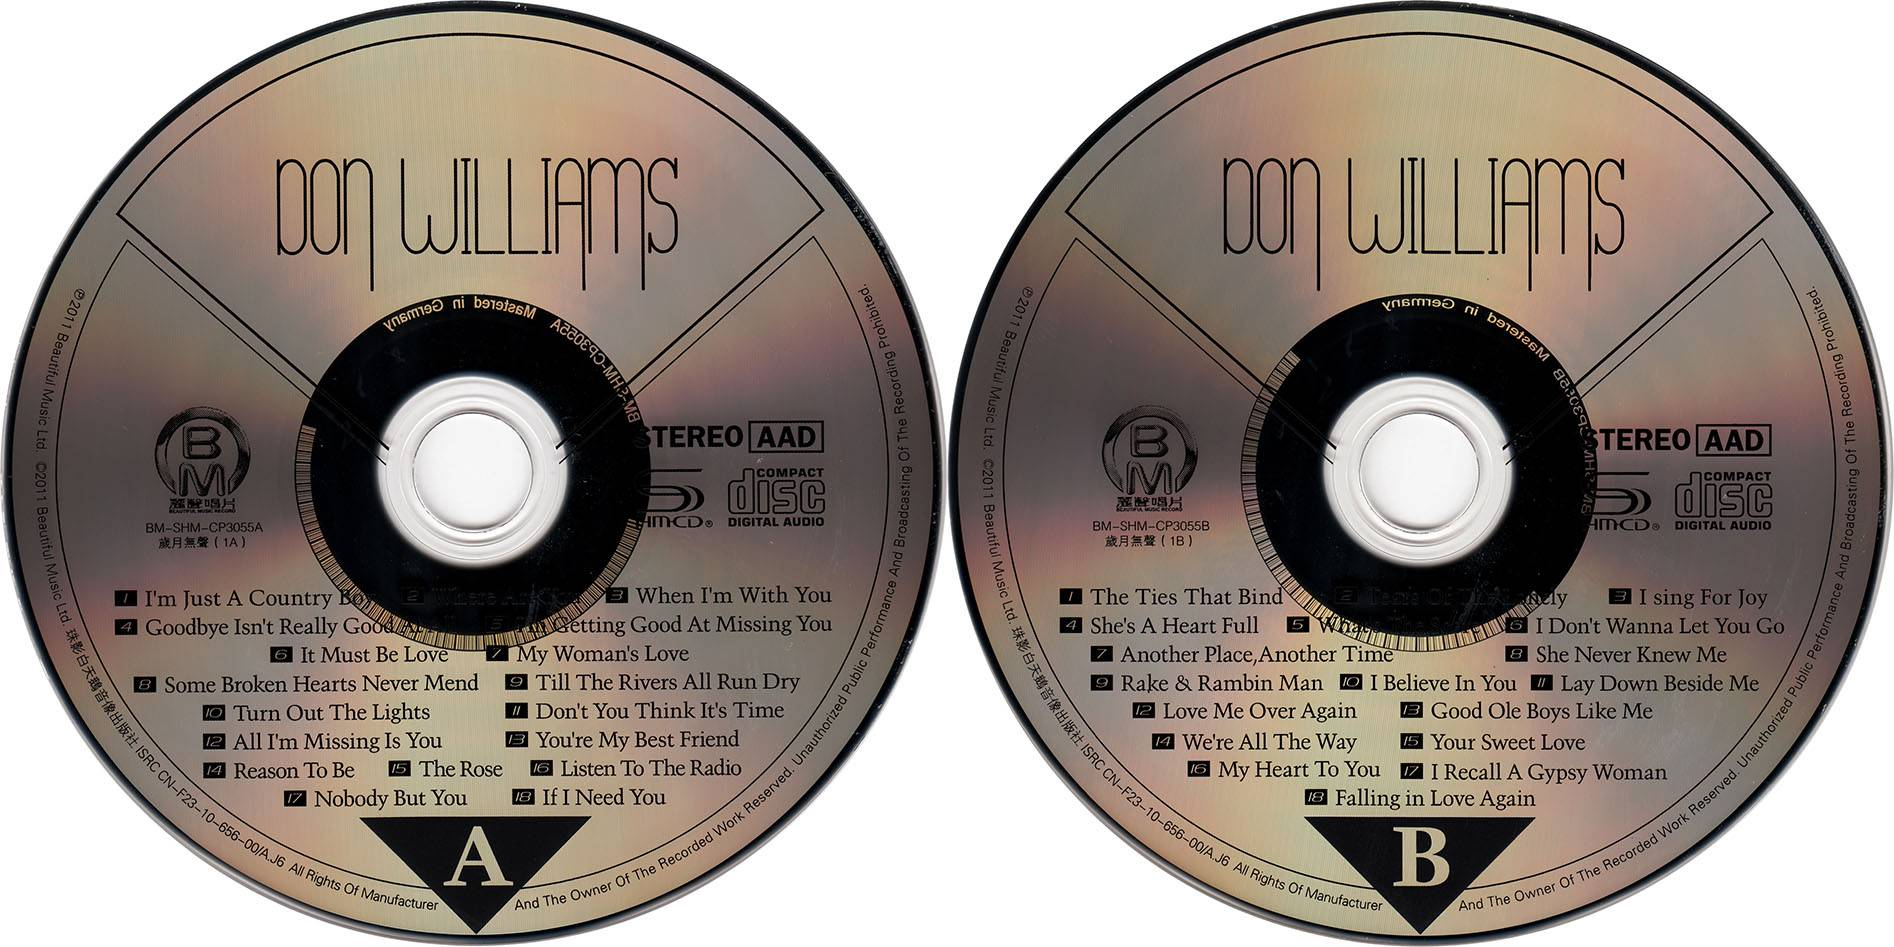 Don Williams - Greatest Hit Best Audiophile (2011) SHM-CD, 2CDs